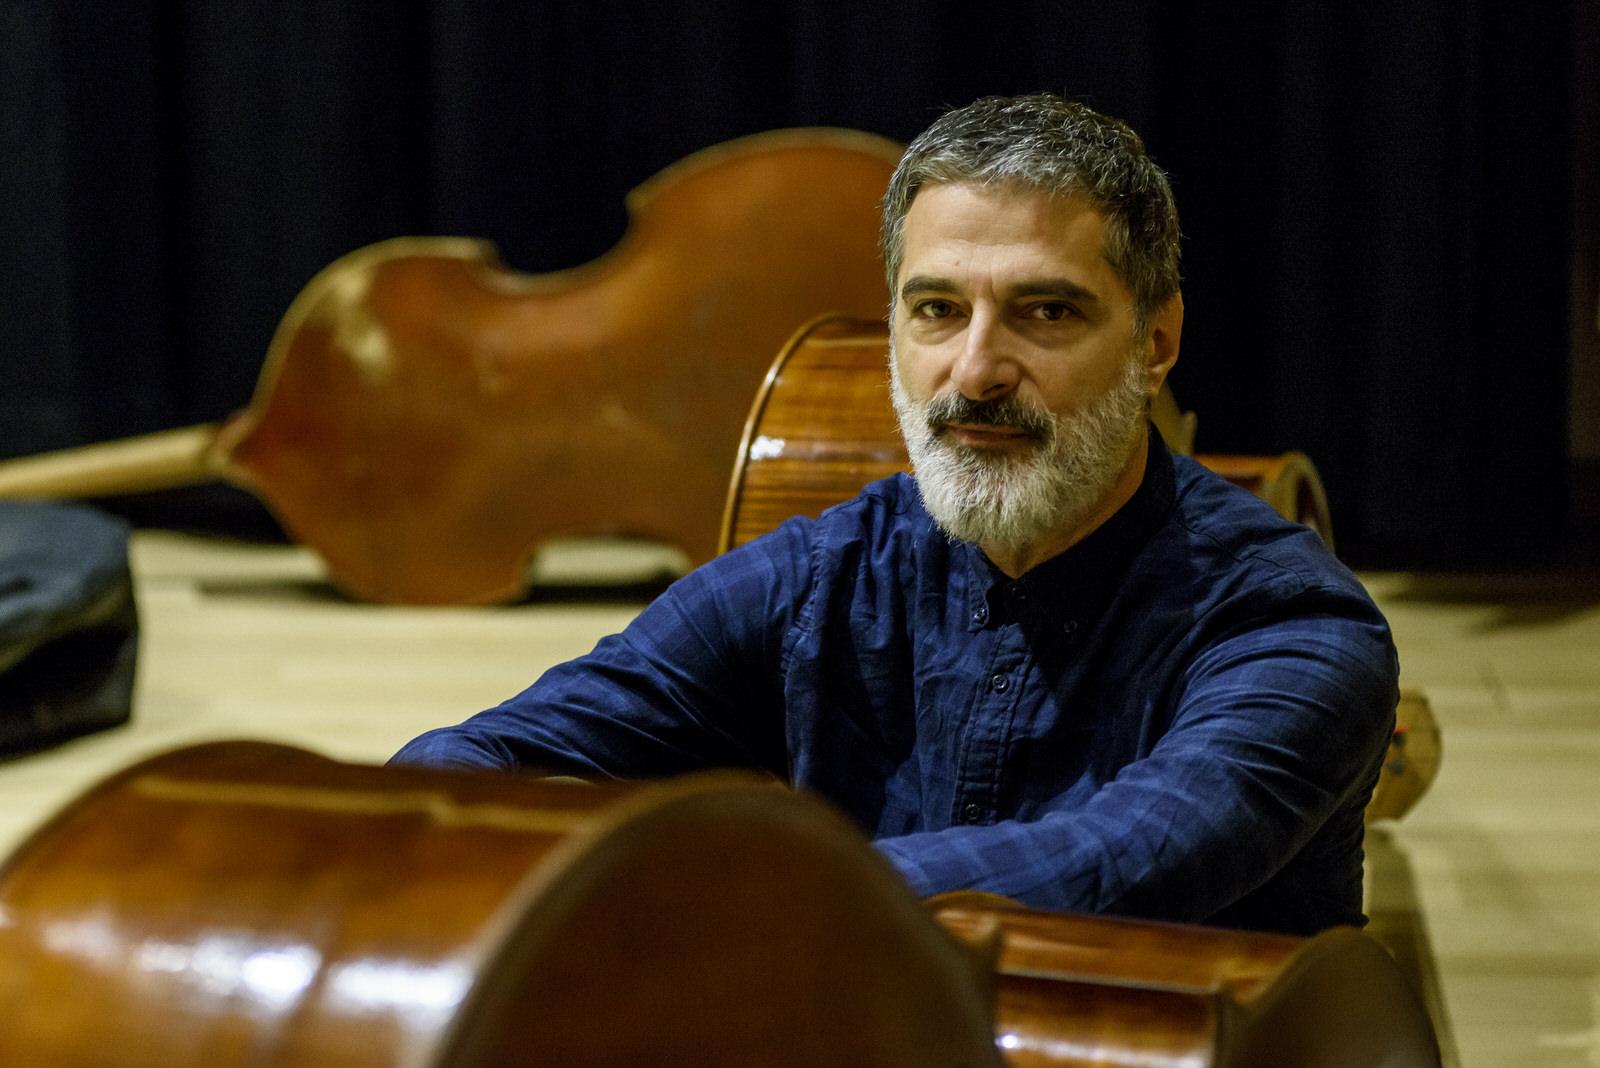 Koumentakis Giorgos3 instruments3